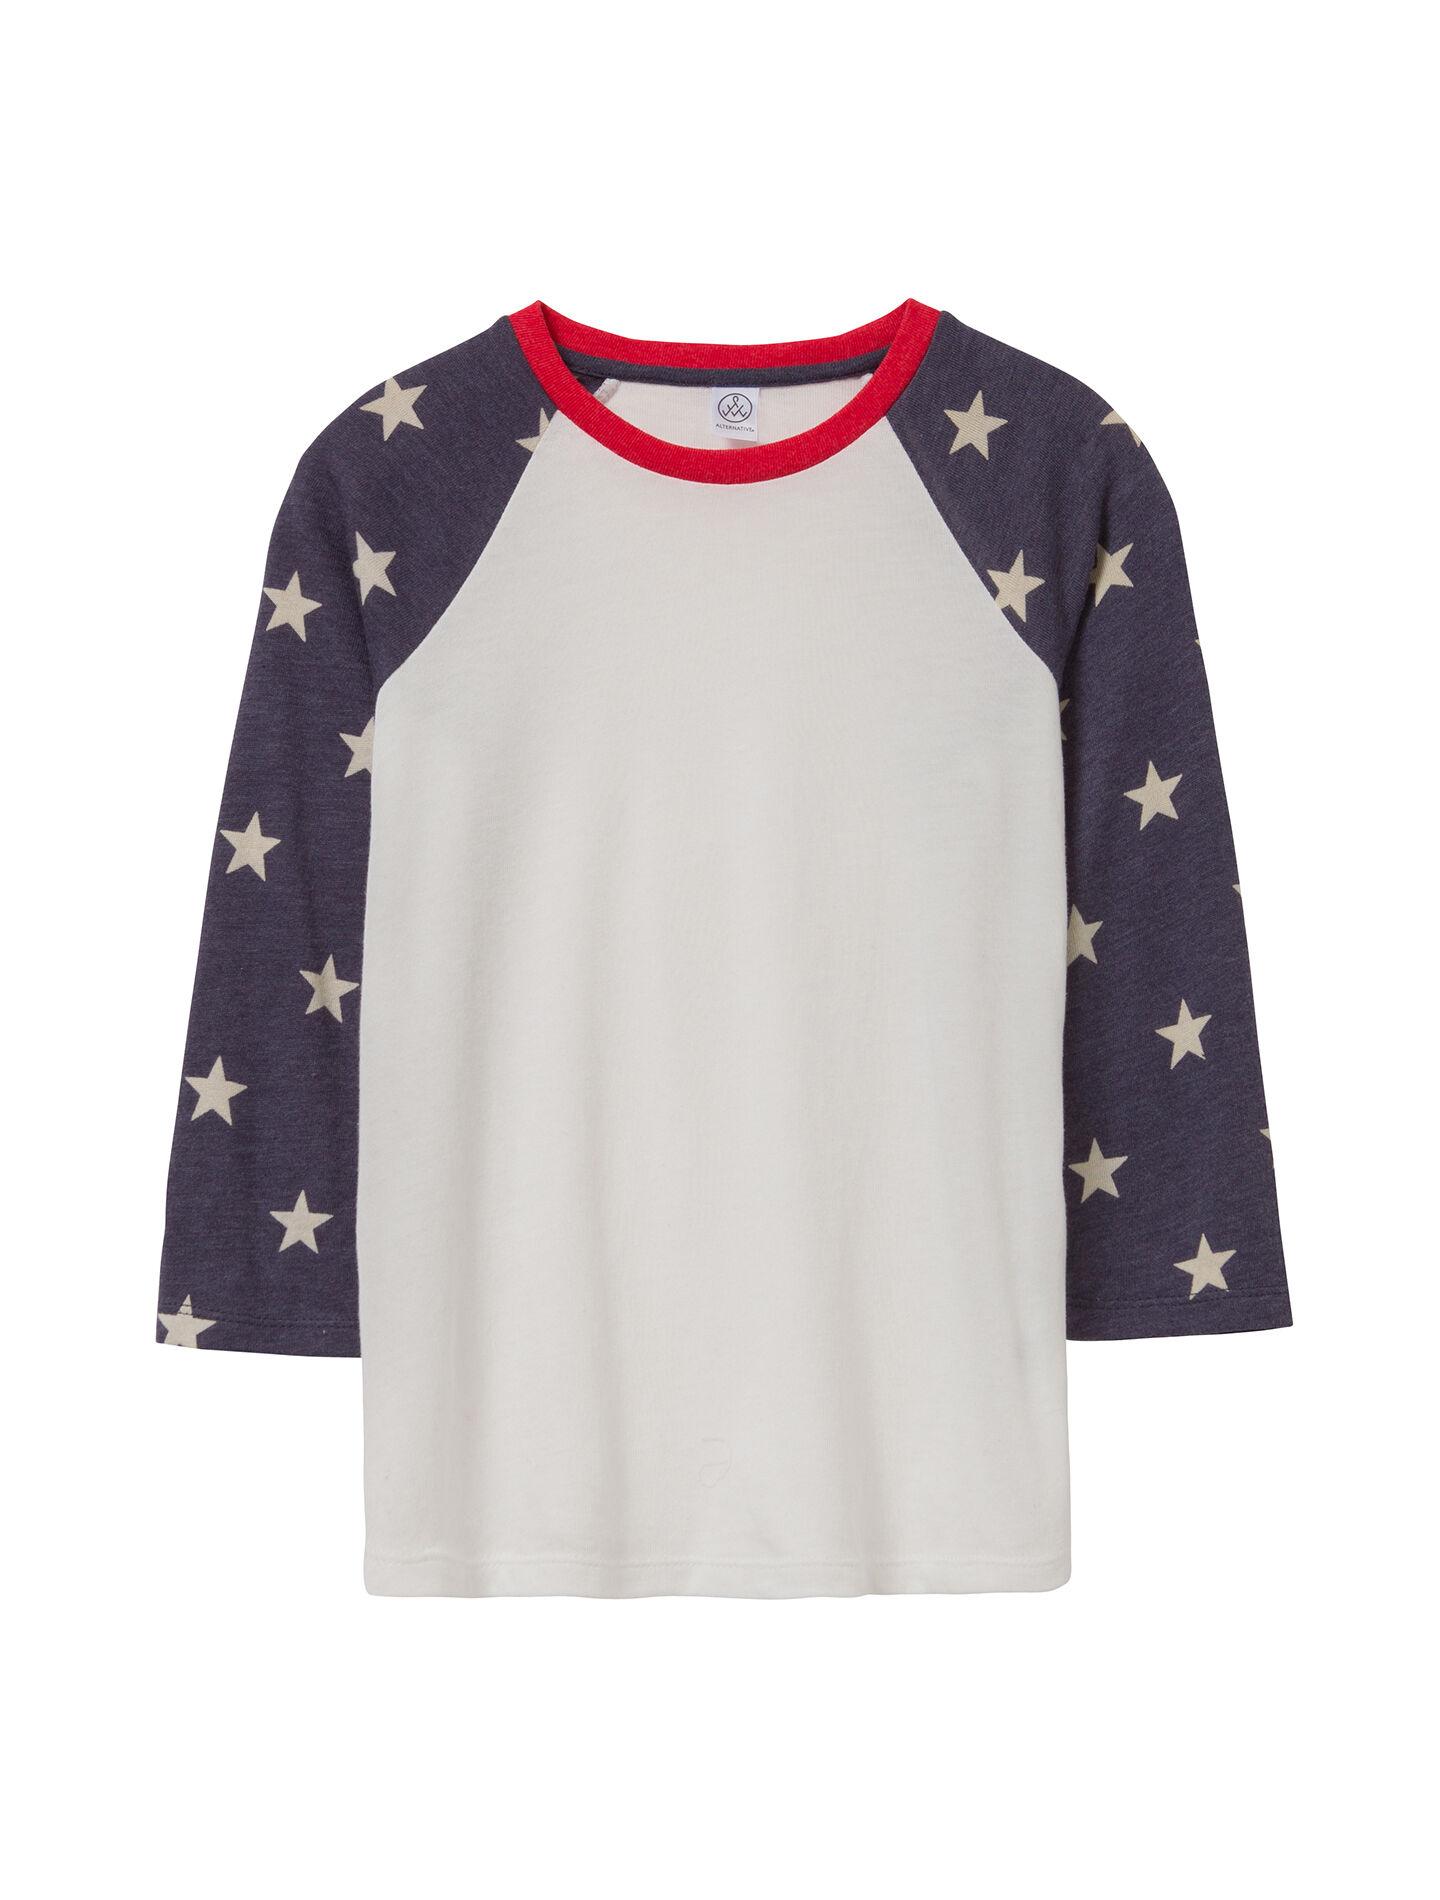 Alternative Apparel Baseball Printed Eco-Jersey Youth T-Shirt - Stars - Size: YL